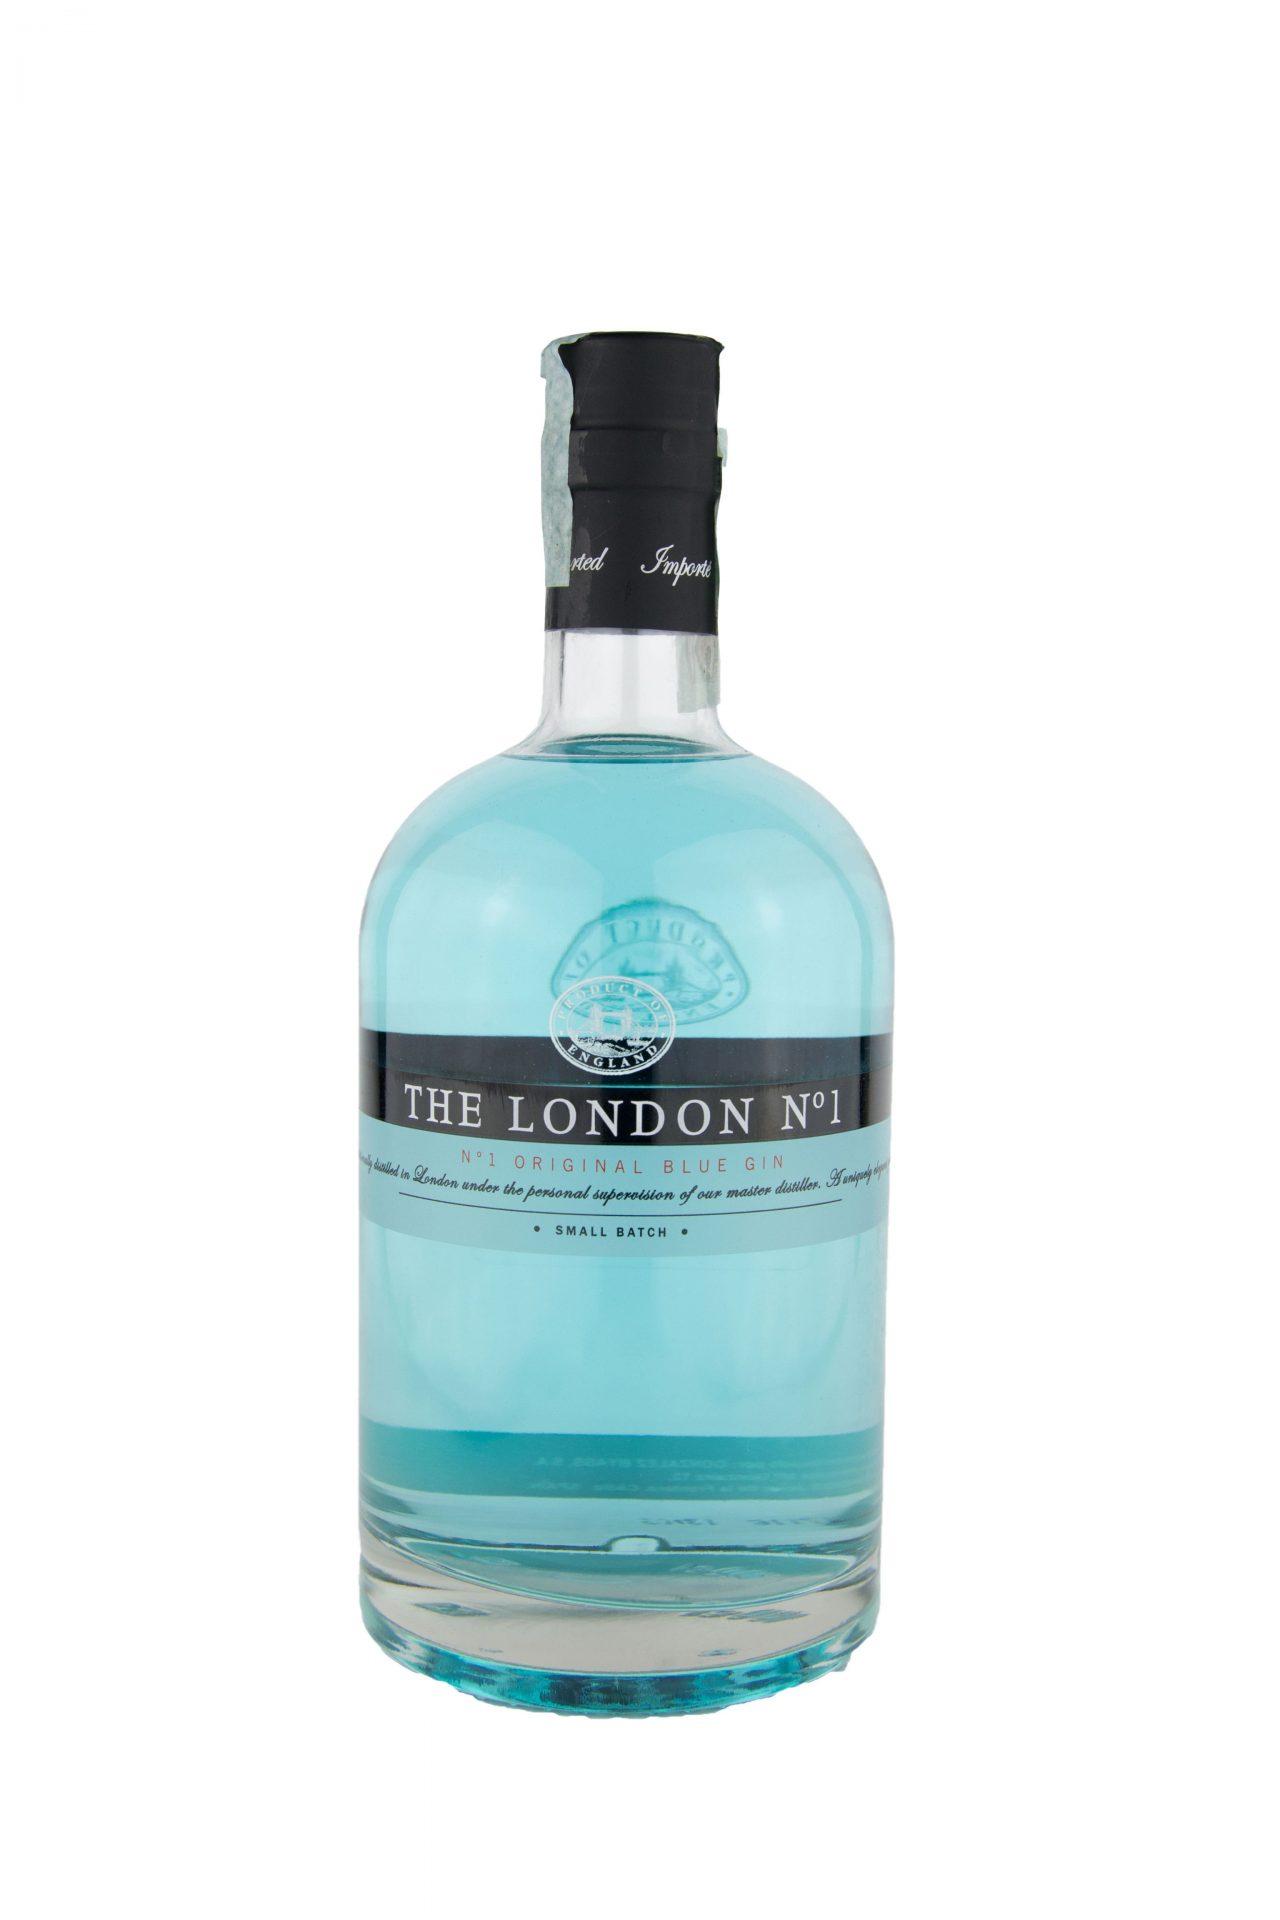 The London N°1 – Small Batch